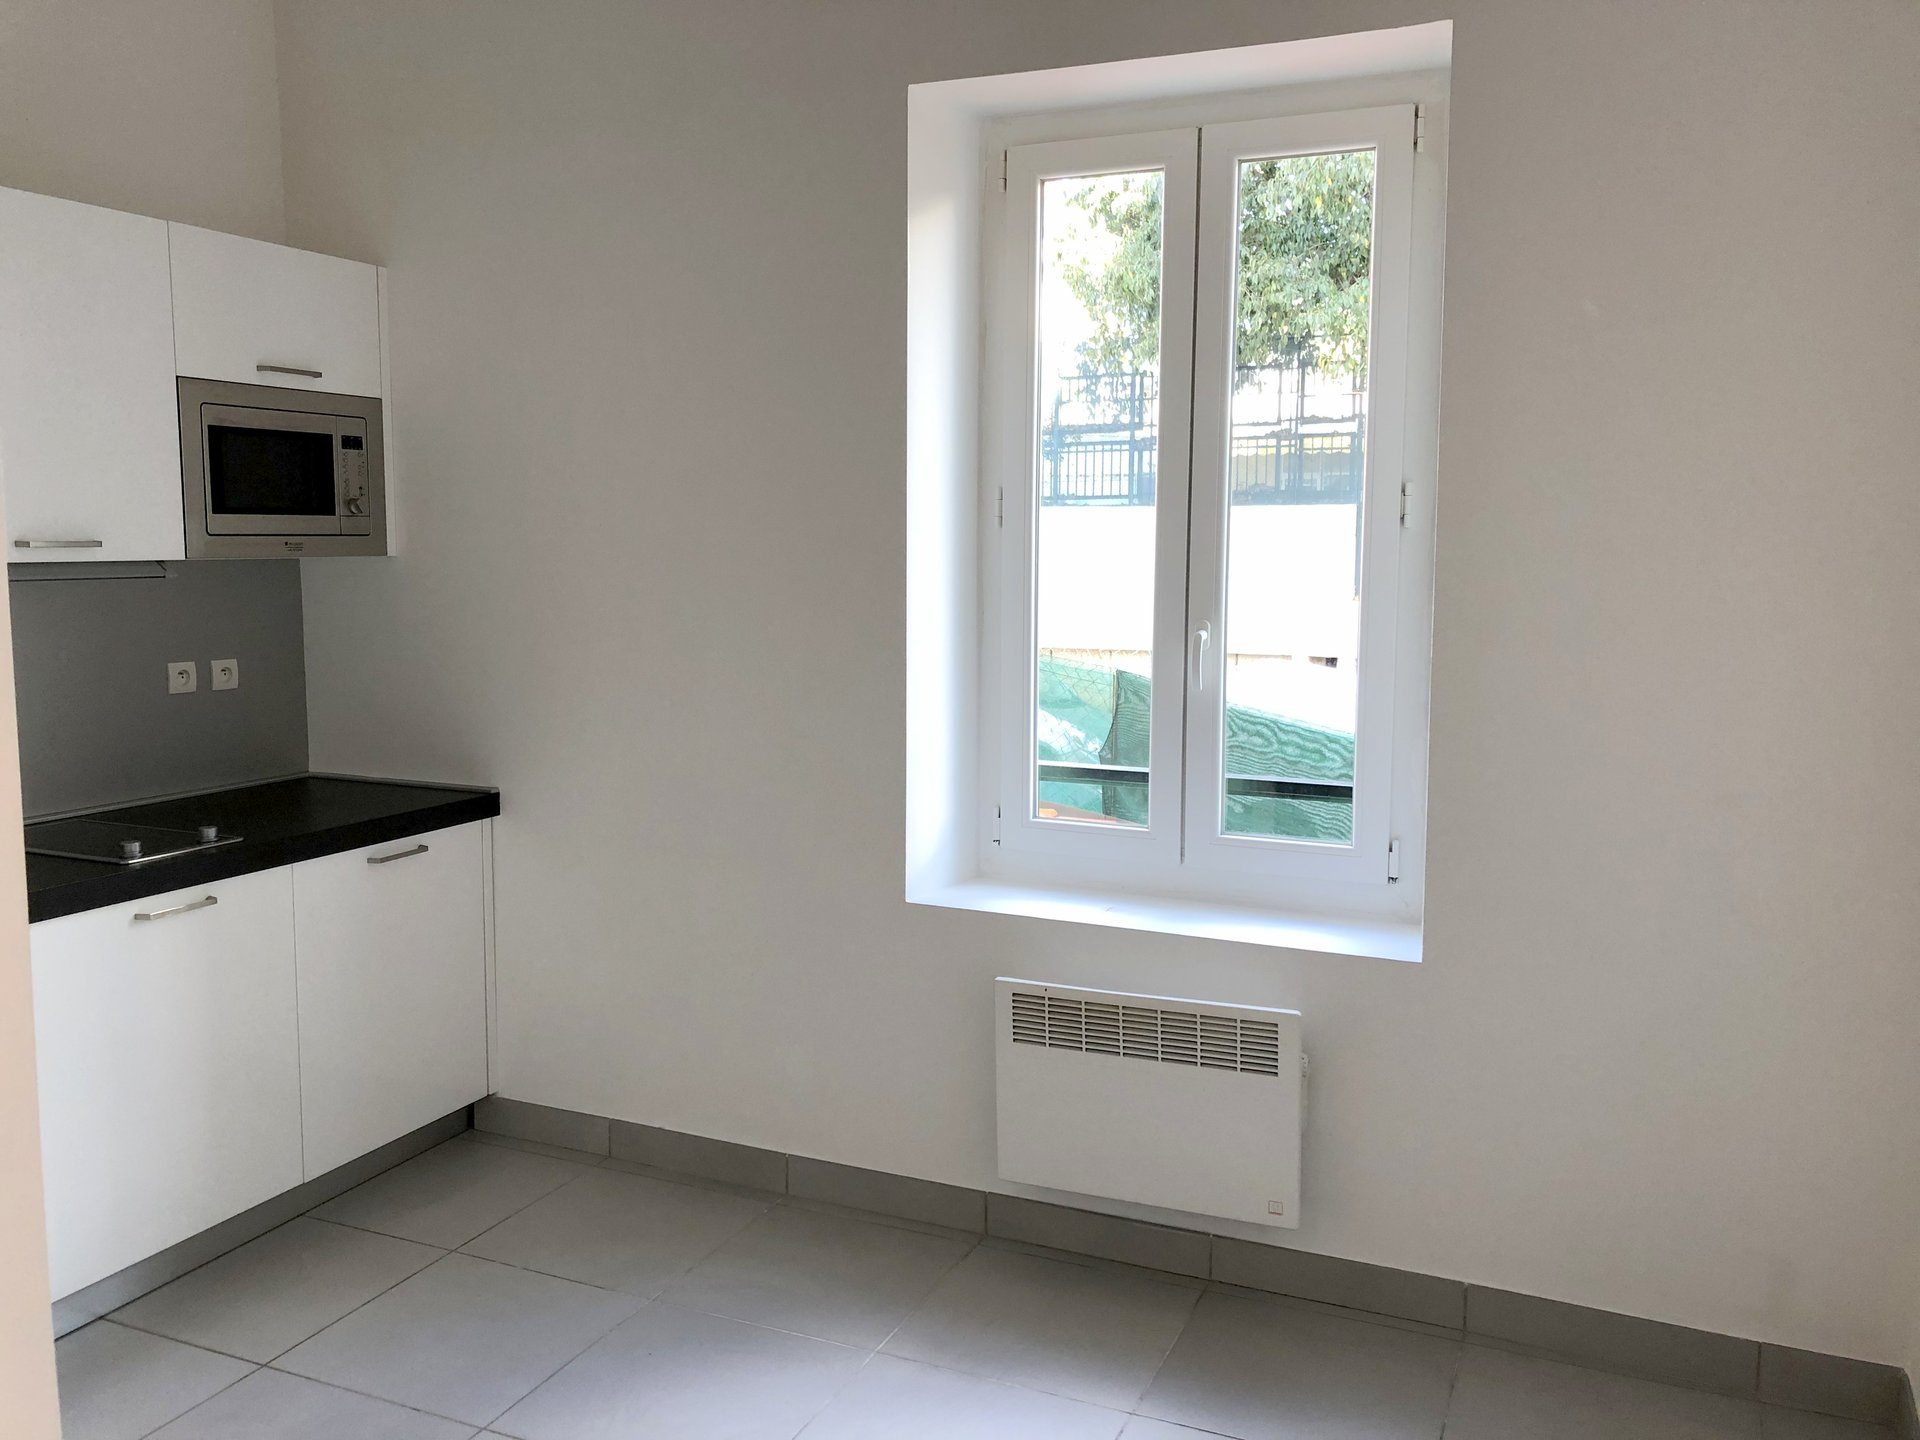 location Nice studio mezzanine 13.06m² situé secteur bellevue